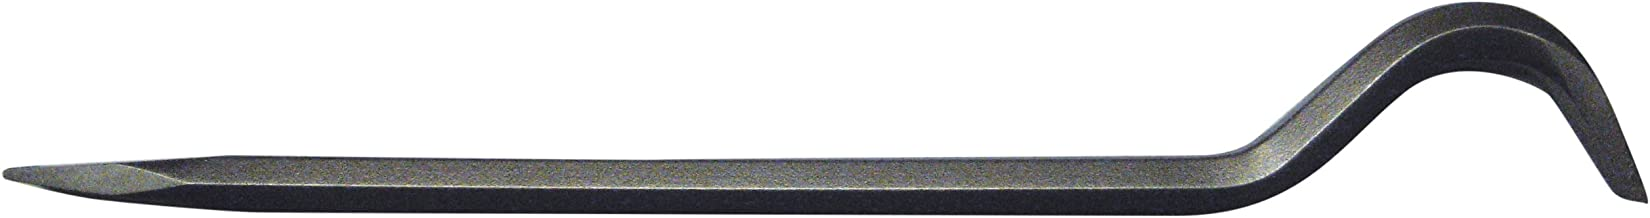 Wright Tool 9M41280 Die Separating Bar, 18